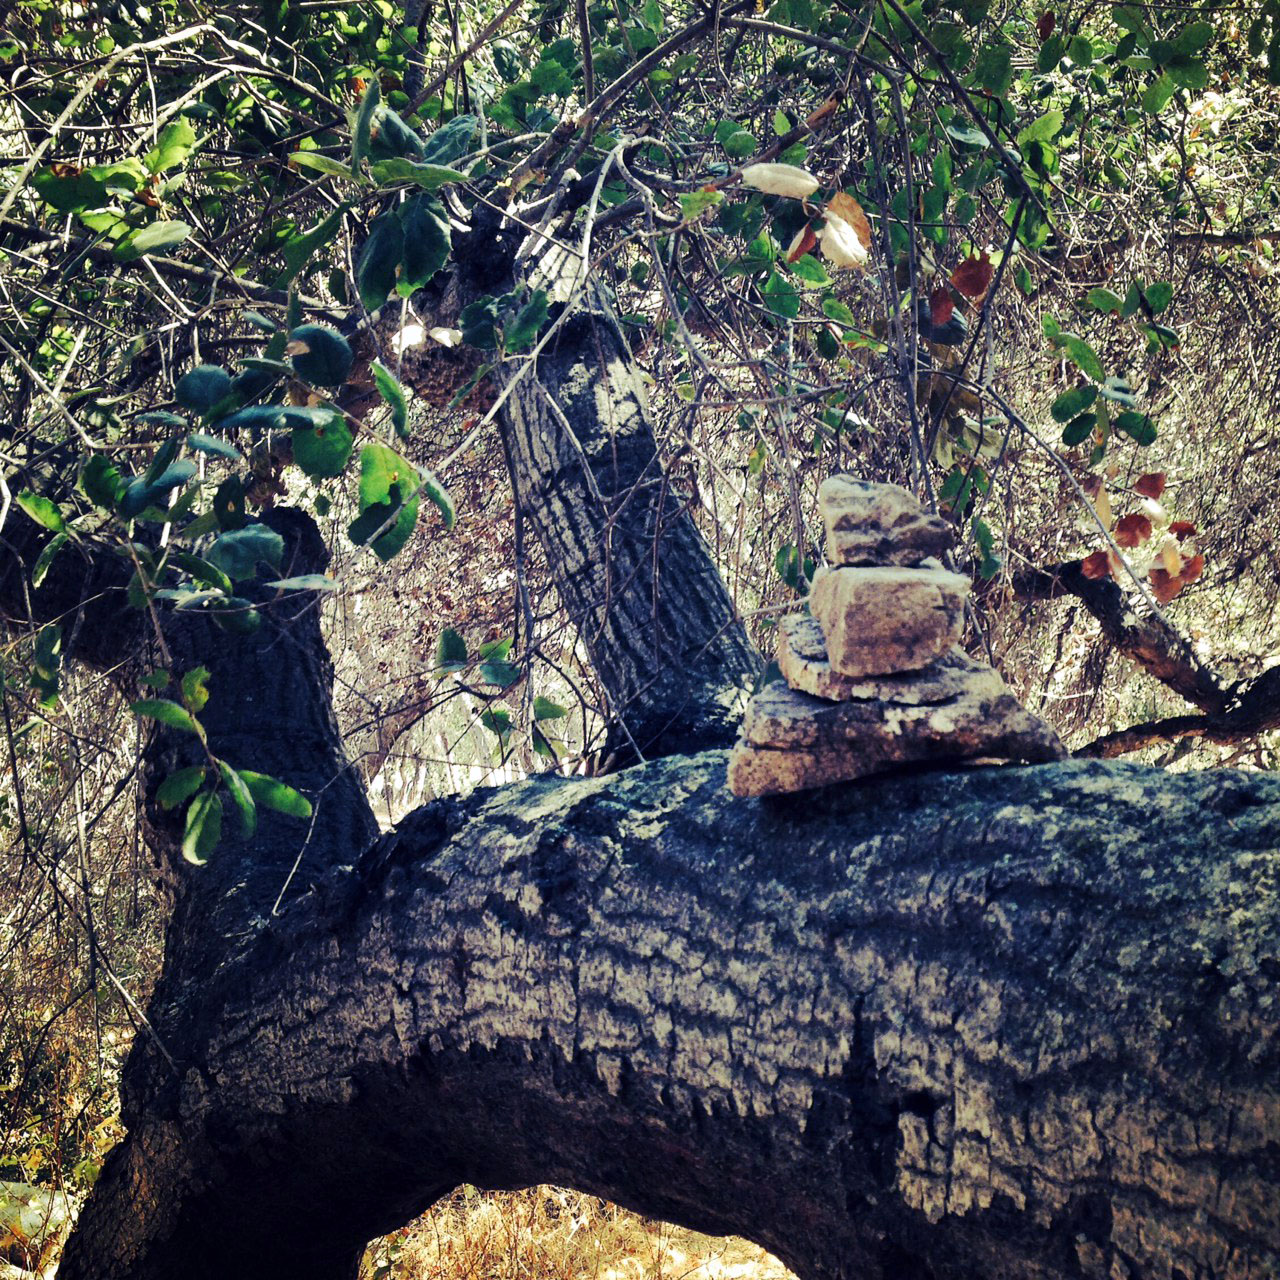 Prayer rocks stacked on a sturdy tree limb